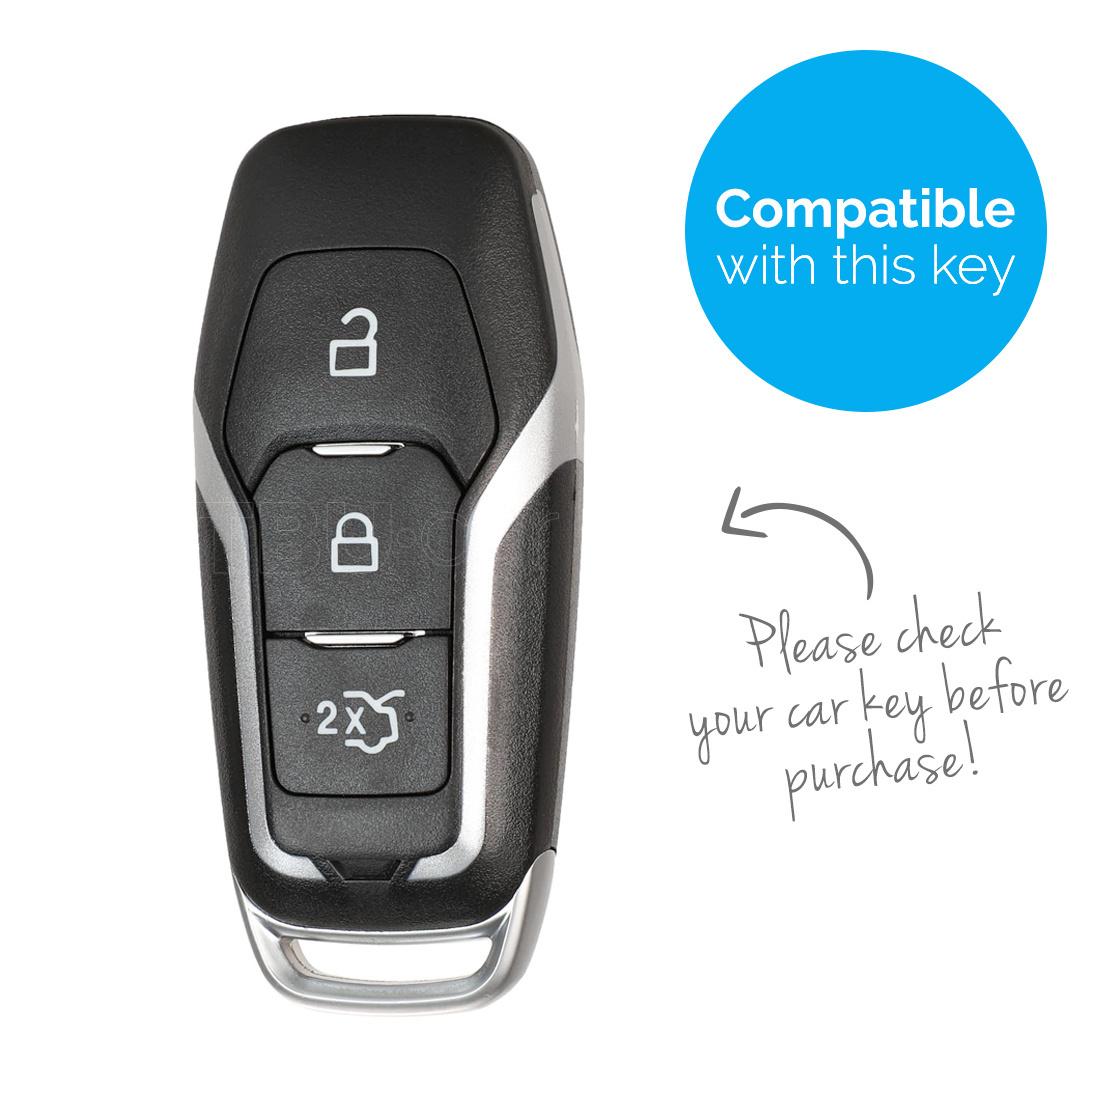 TBU car TBU car Sleutel cover compatibel met Ford - TPU sleutel hoesje / beschermhoesje autosleutel - Chrome